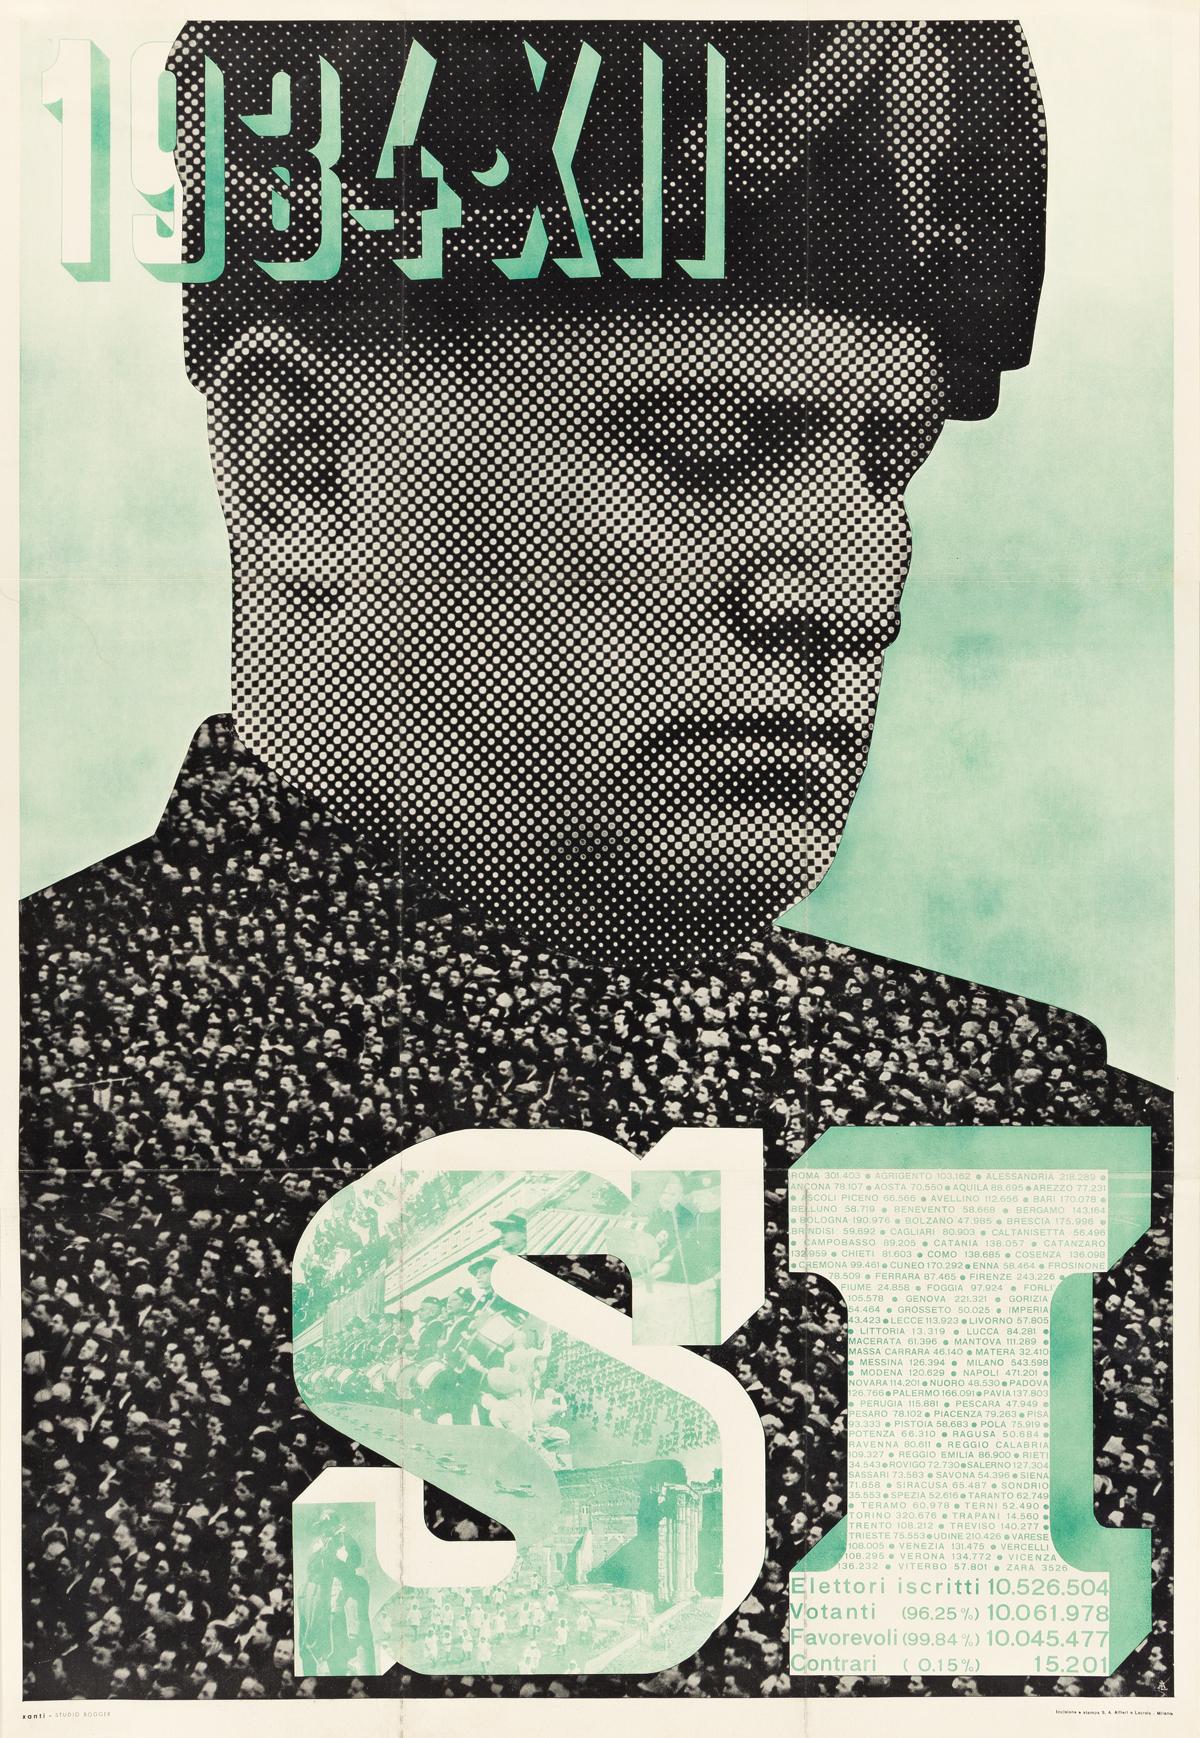 XANTI SCHAWINSKY (1904-1979).  1934 • XII / SI. Poster insert. 1934. 37½x25½ inches, 95¼x64¾ cm. Alfieri E Lacroix, Milan.